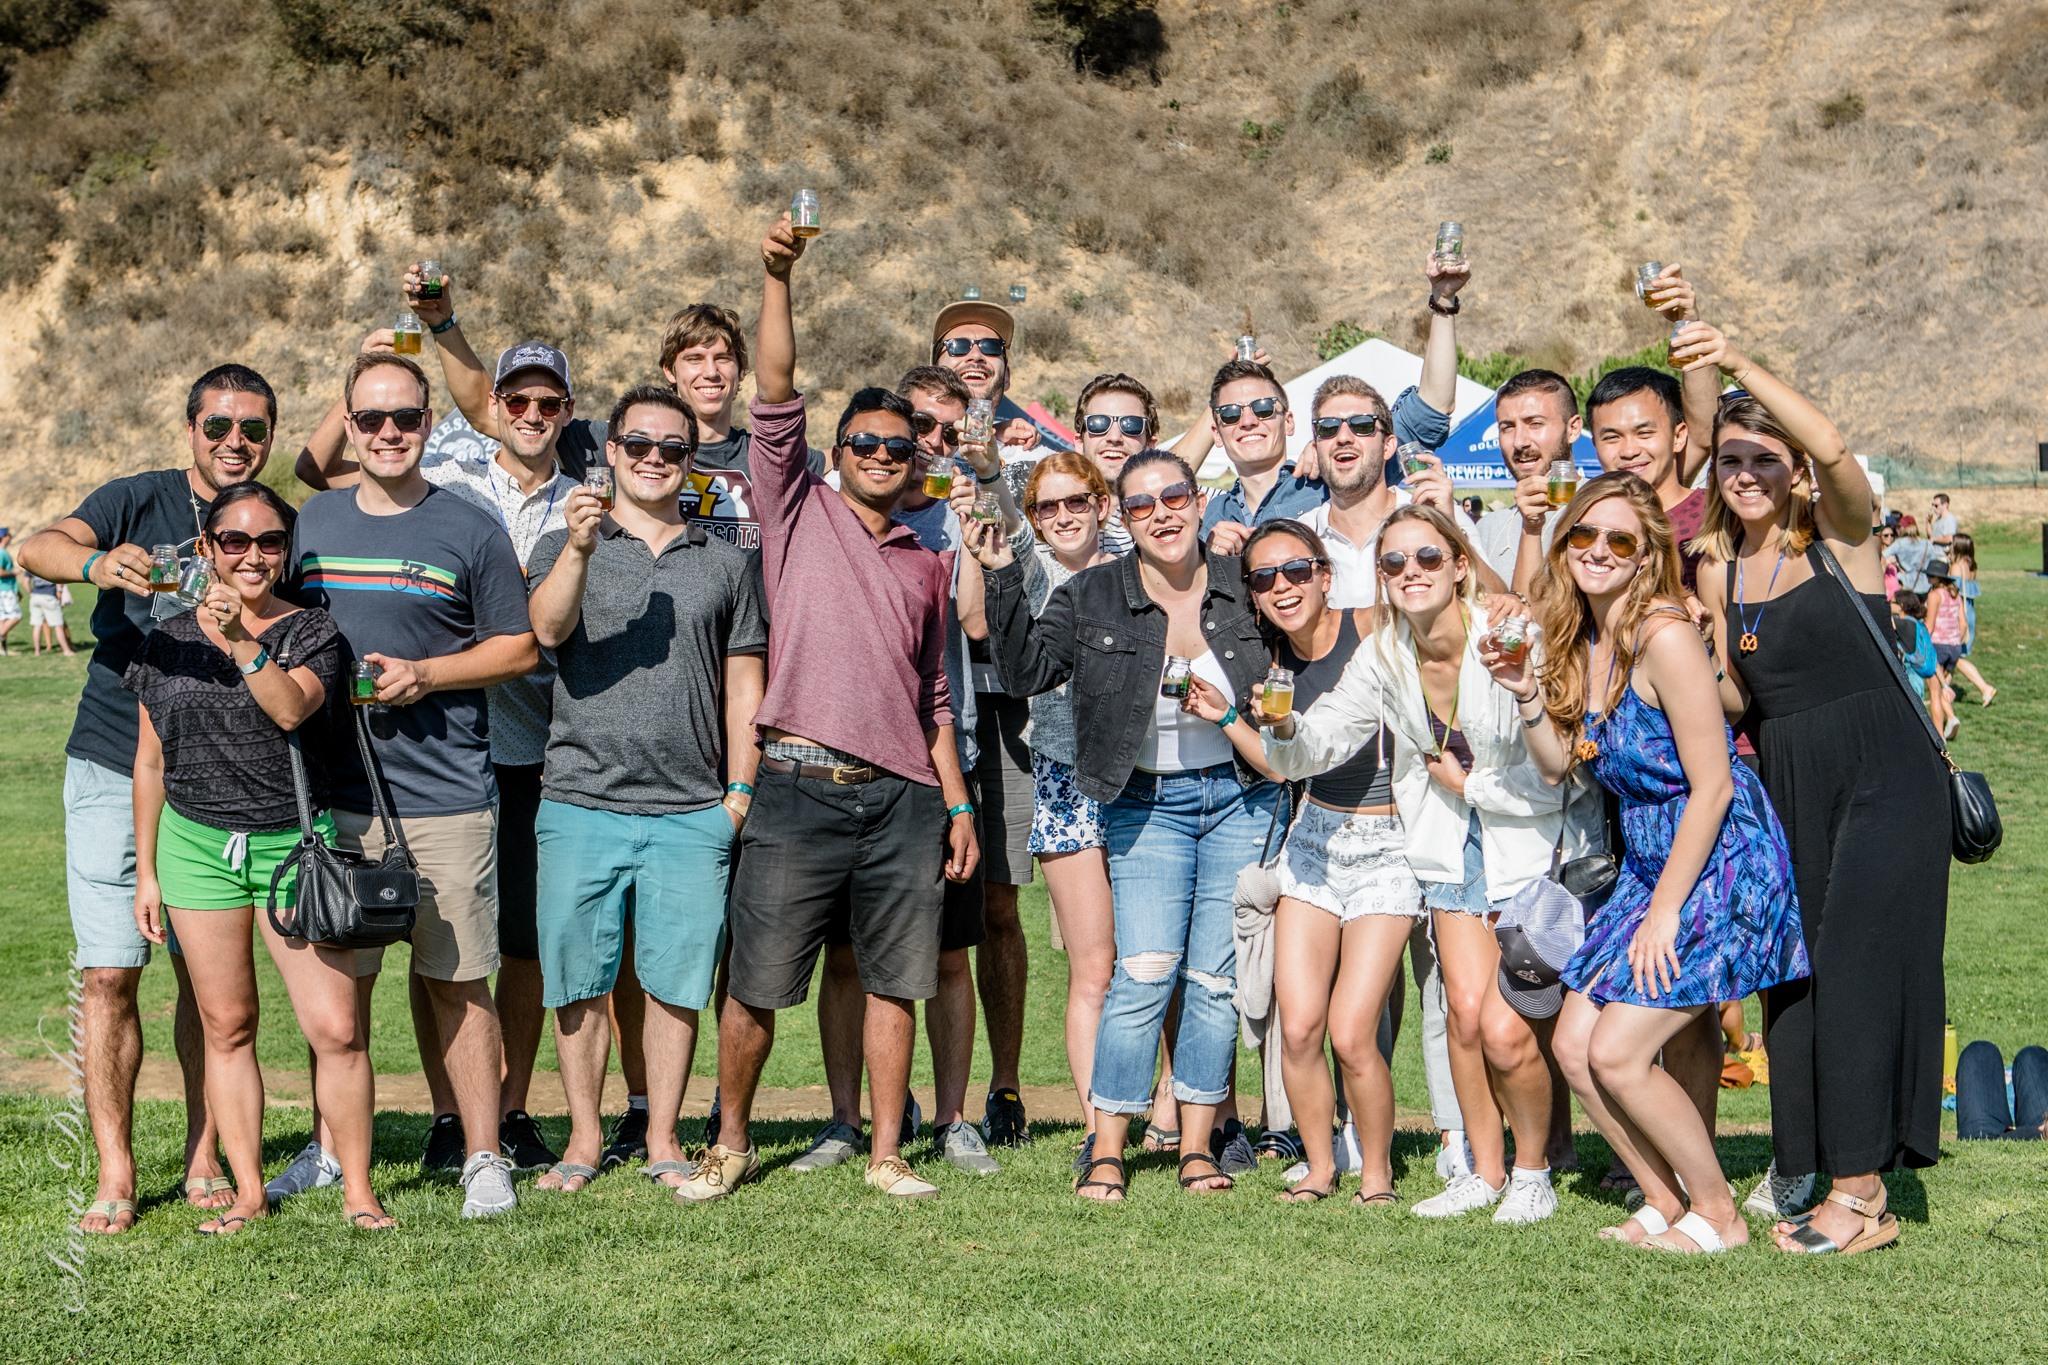 Santa Barbara Beer Festival (aka Pints for the Park)